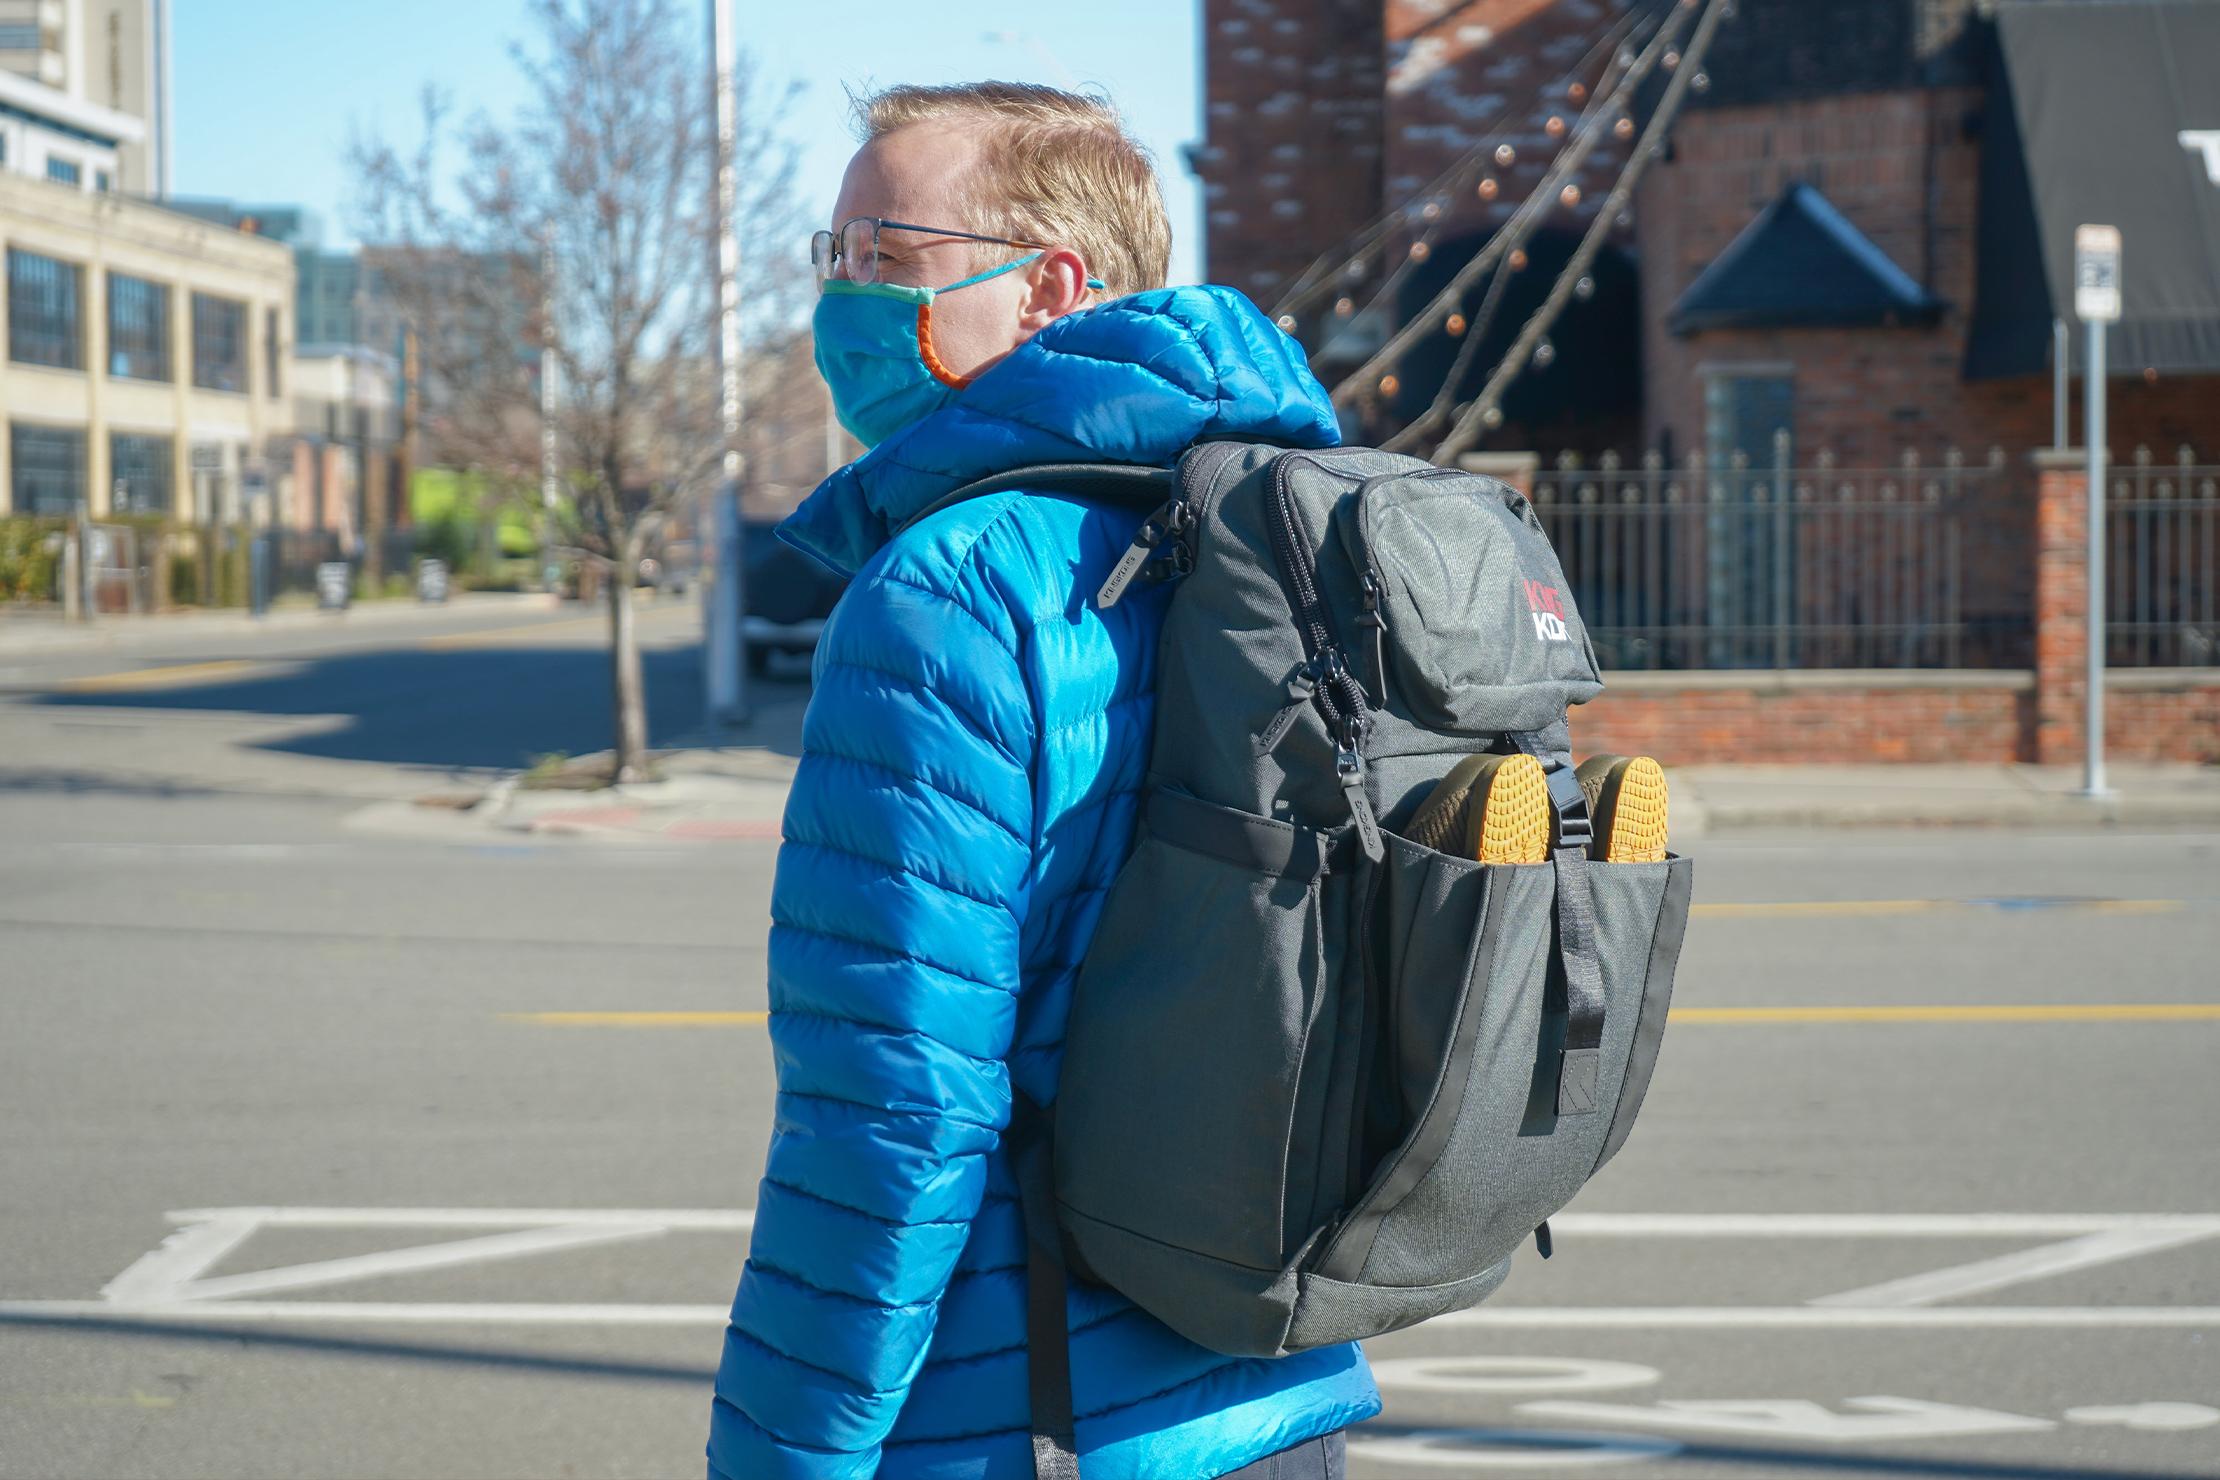 King Kong Apparel PLUS26 Backpack in Detroit